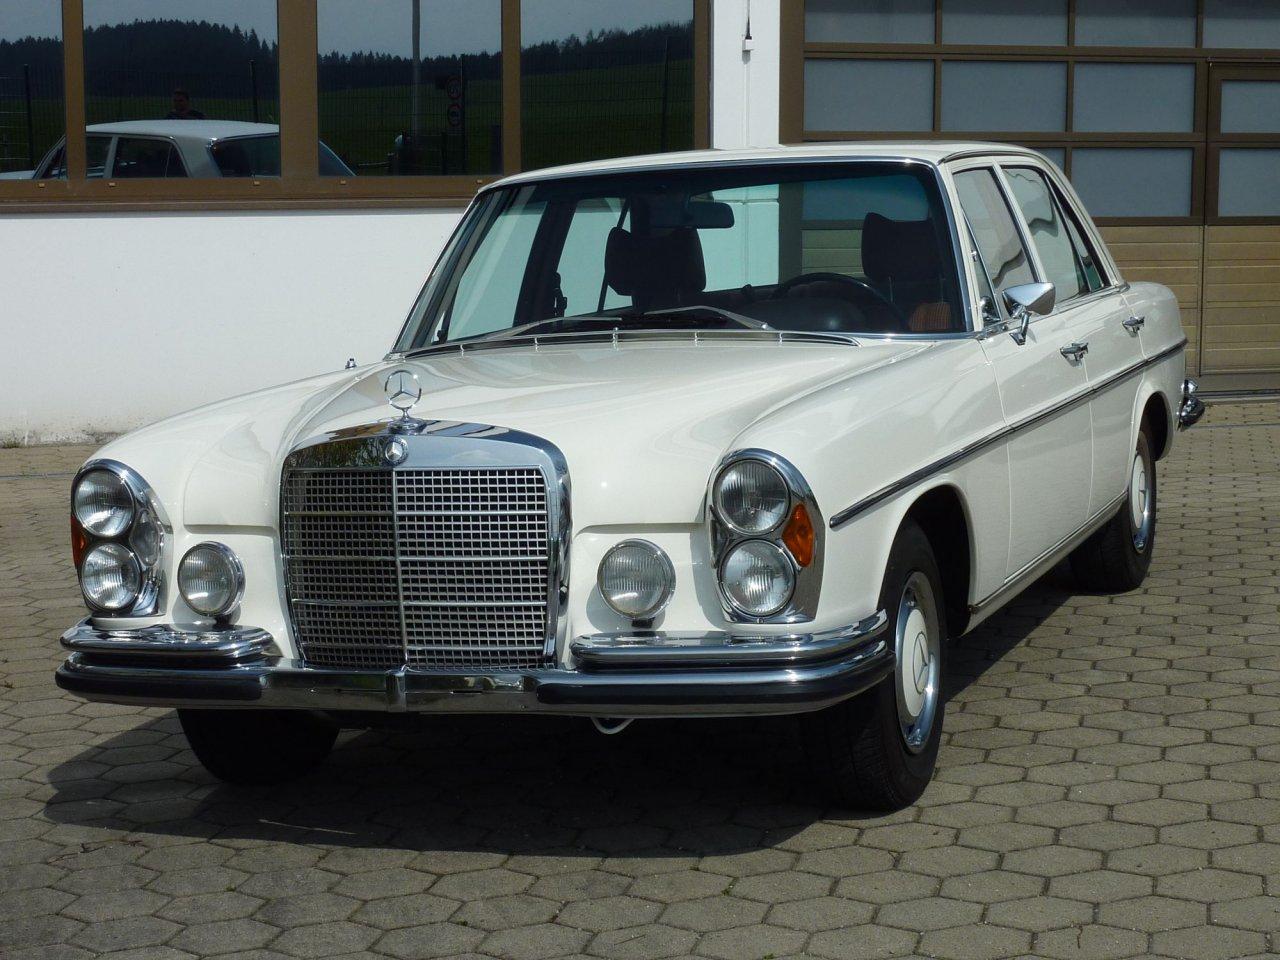 MB 280 SE 3,5 163.839km  Bj. 1972 18,5 Std. Zymöl Glasur